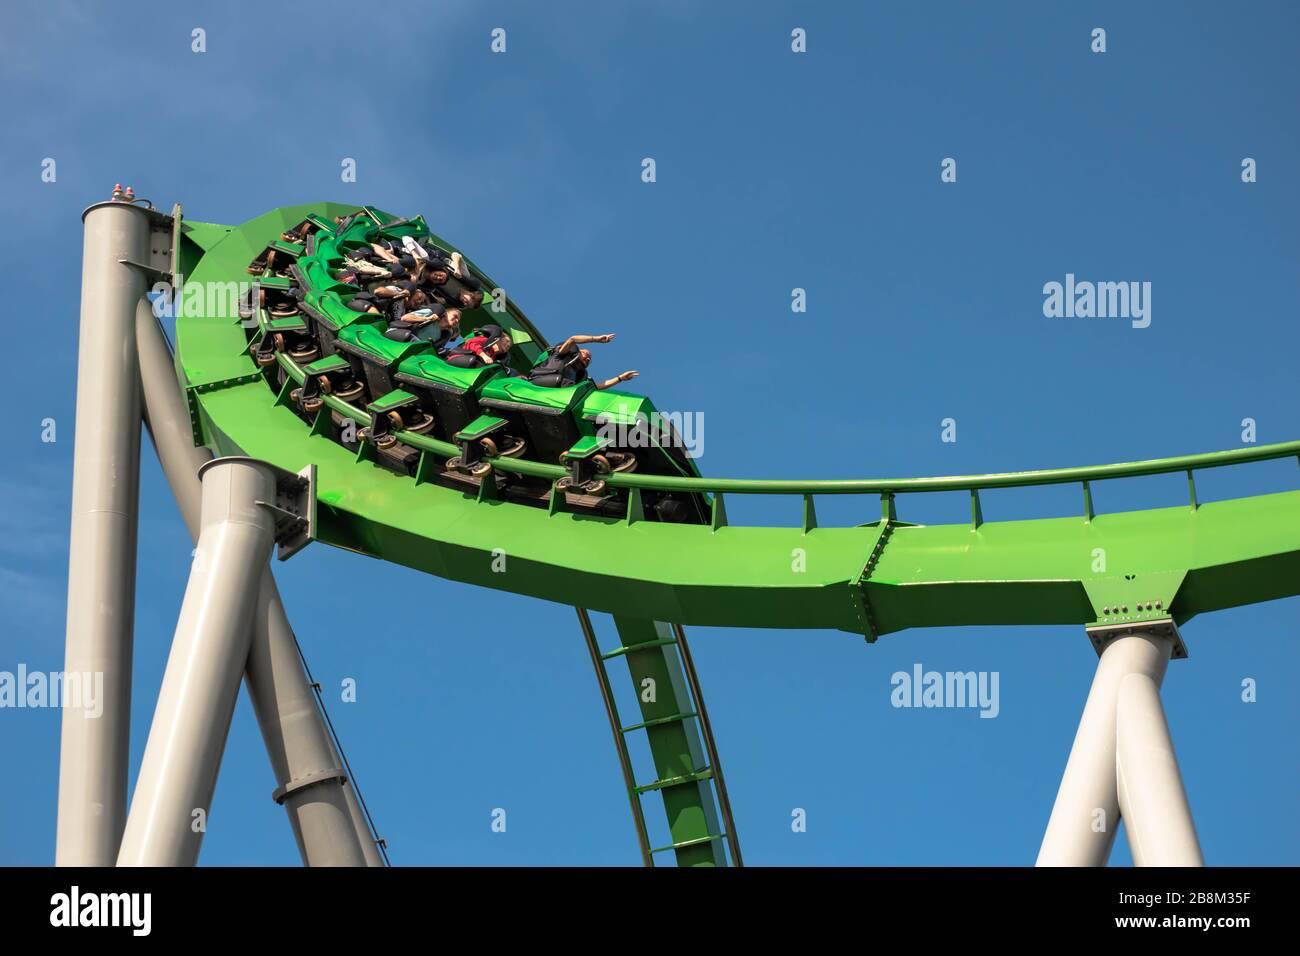 Orlando, Florida. March 02, 2019. People having fun The Incredible Hulk Coaster at Universals Islands of Adventure Stock Photo